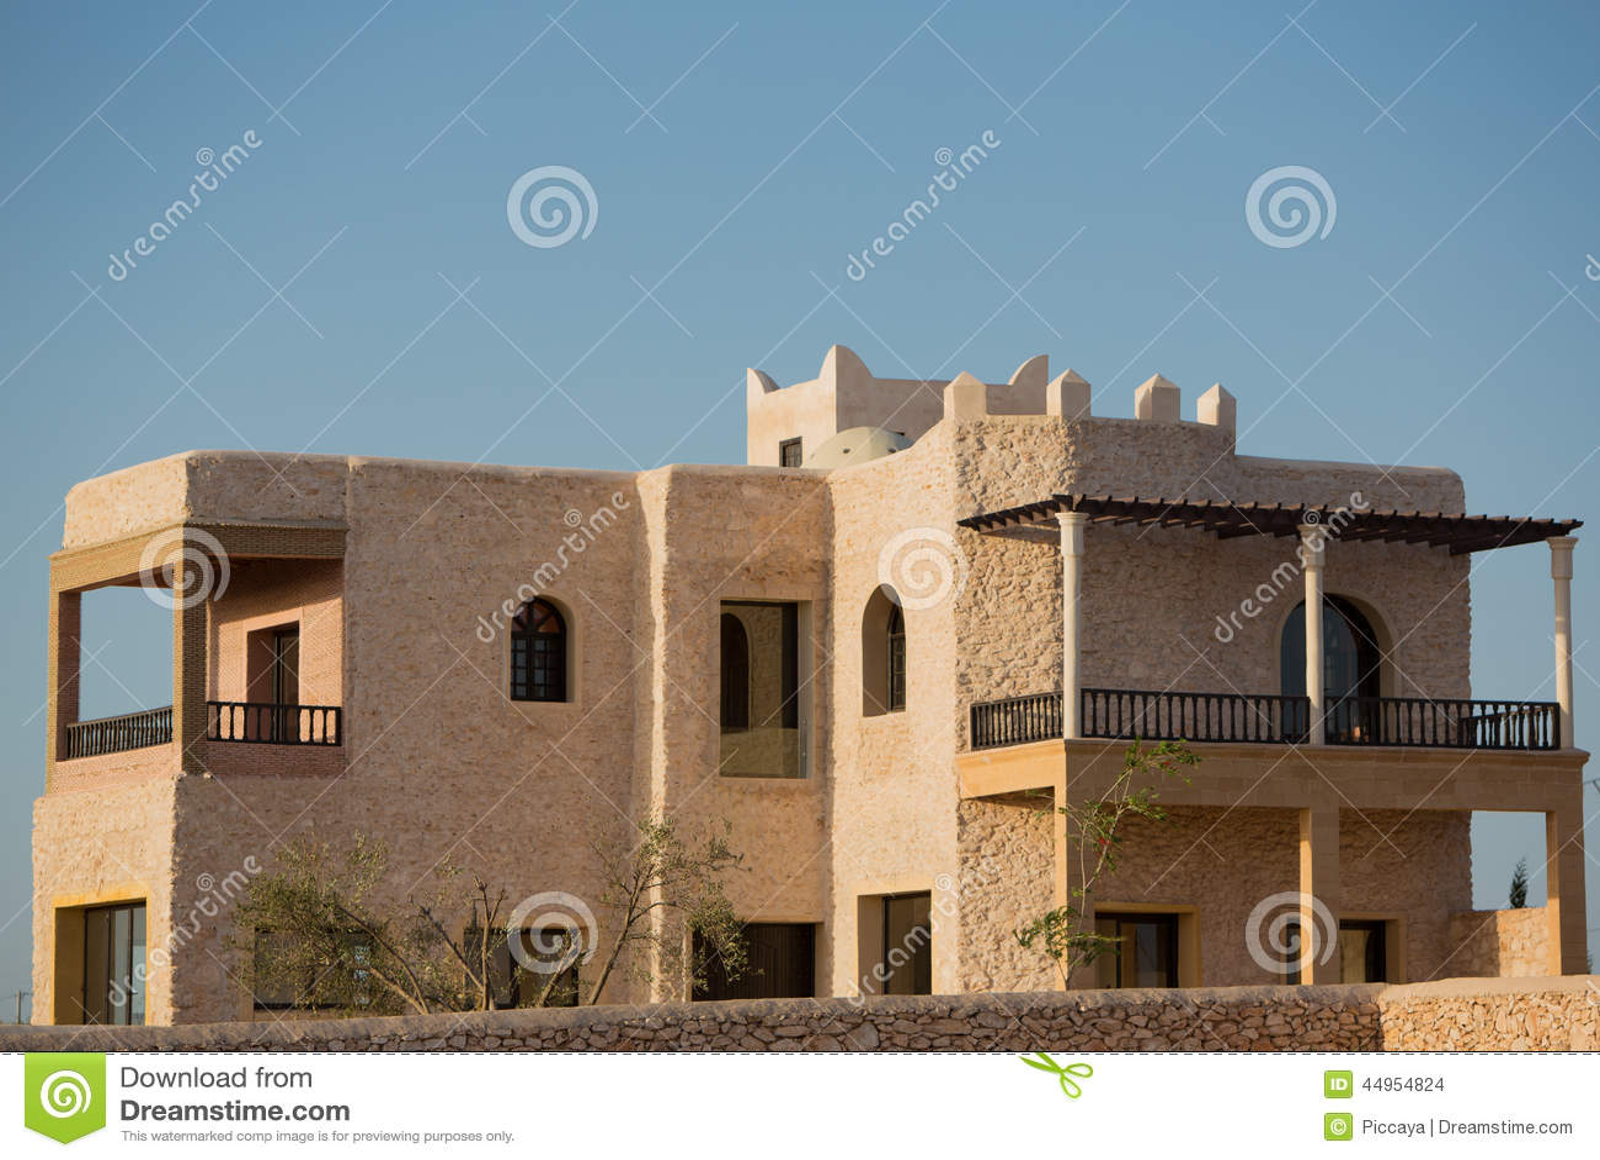 Moderne villa in essaouira bij zonsondergang stock foto afbeelding 44954824 - Foto gevel moderne villa ...